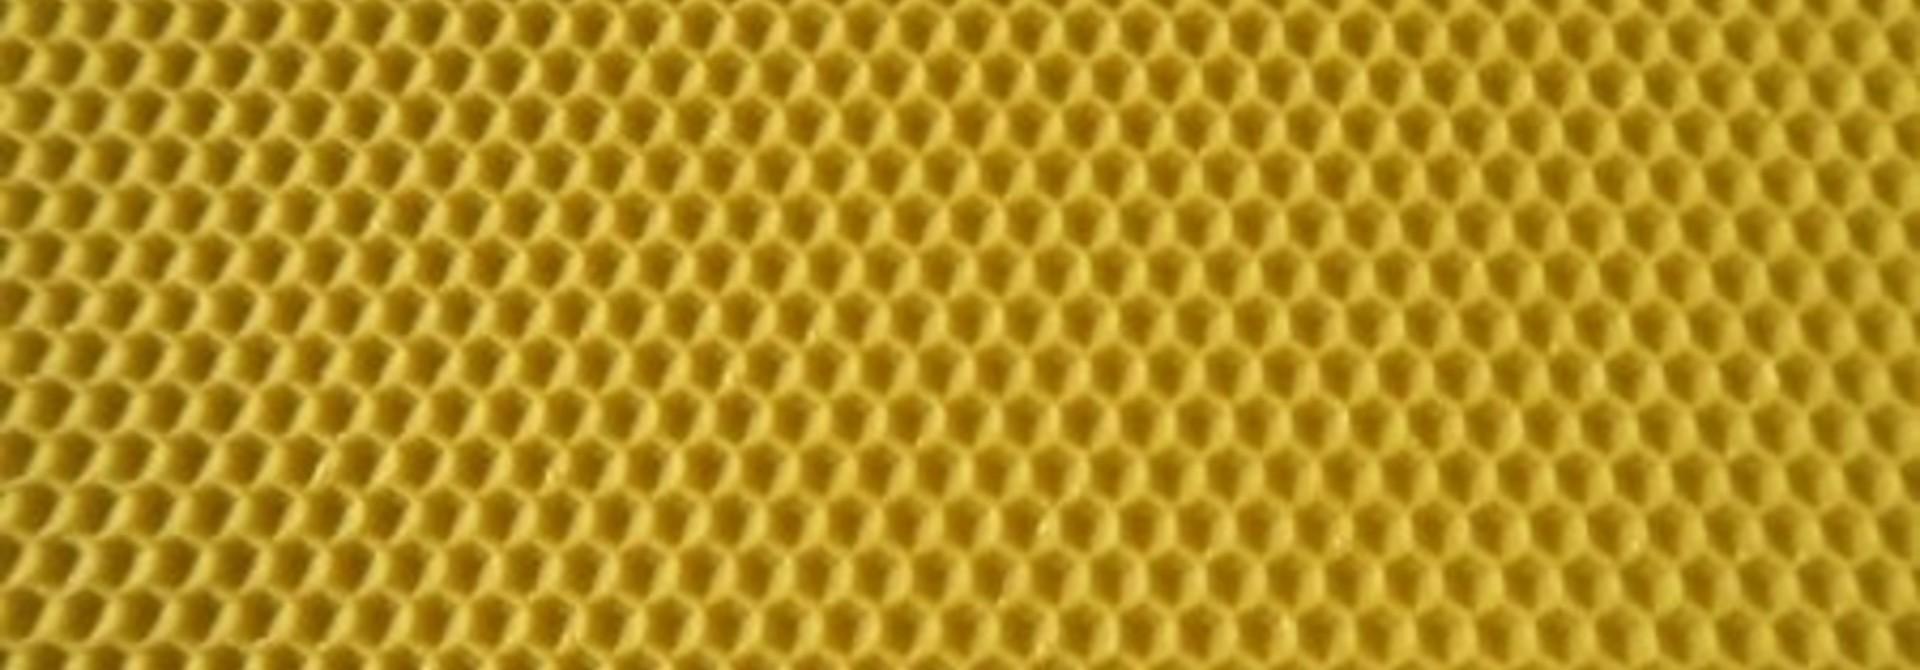 Feuilles en cire d'abeille certifiée - Zander